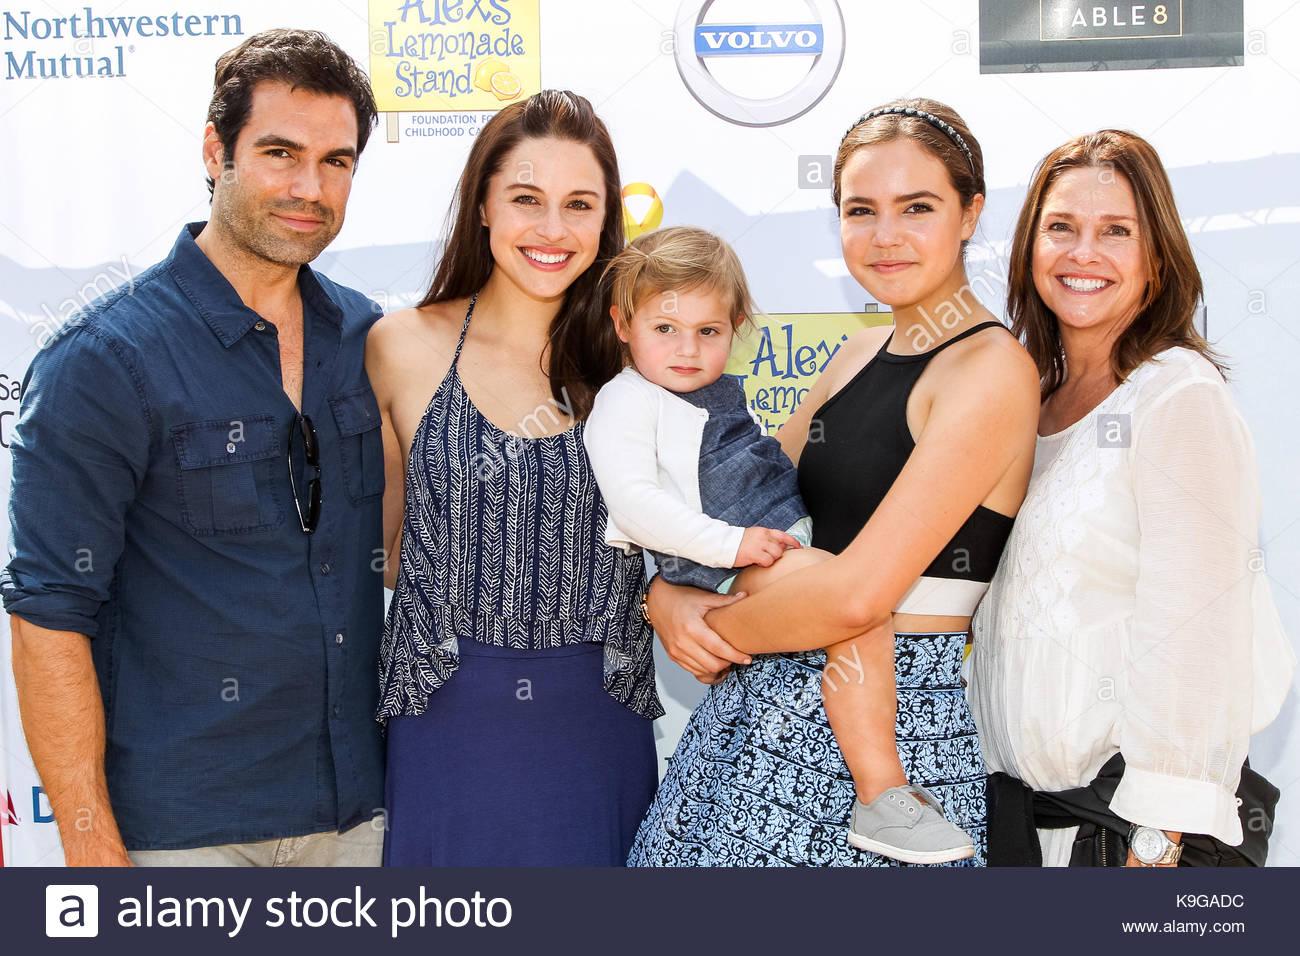 Aicelle Santos (b. 1985),Lisa Daniels (actress) Hot fotos Yaya DaCosta,Anett Griffel EST